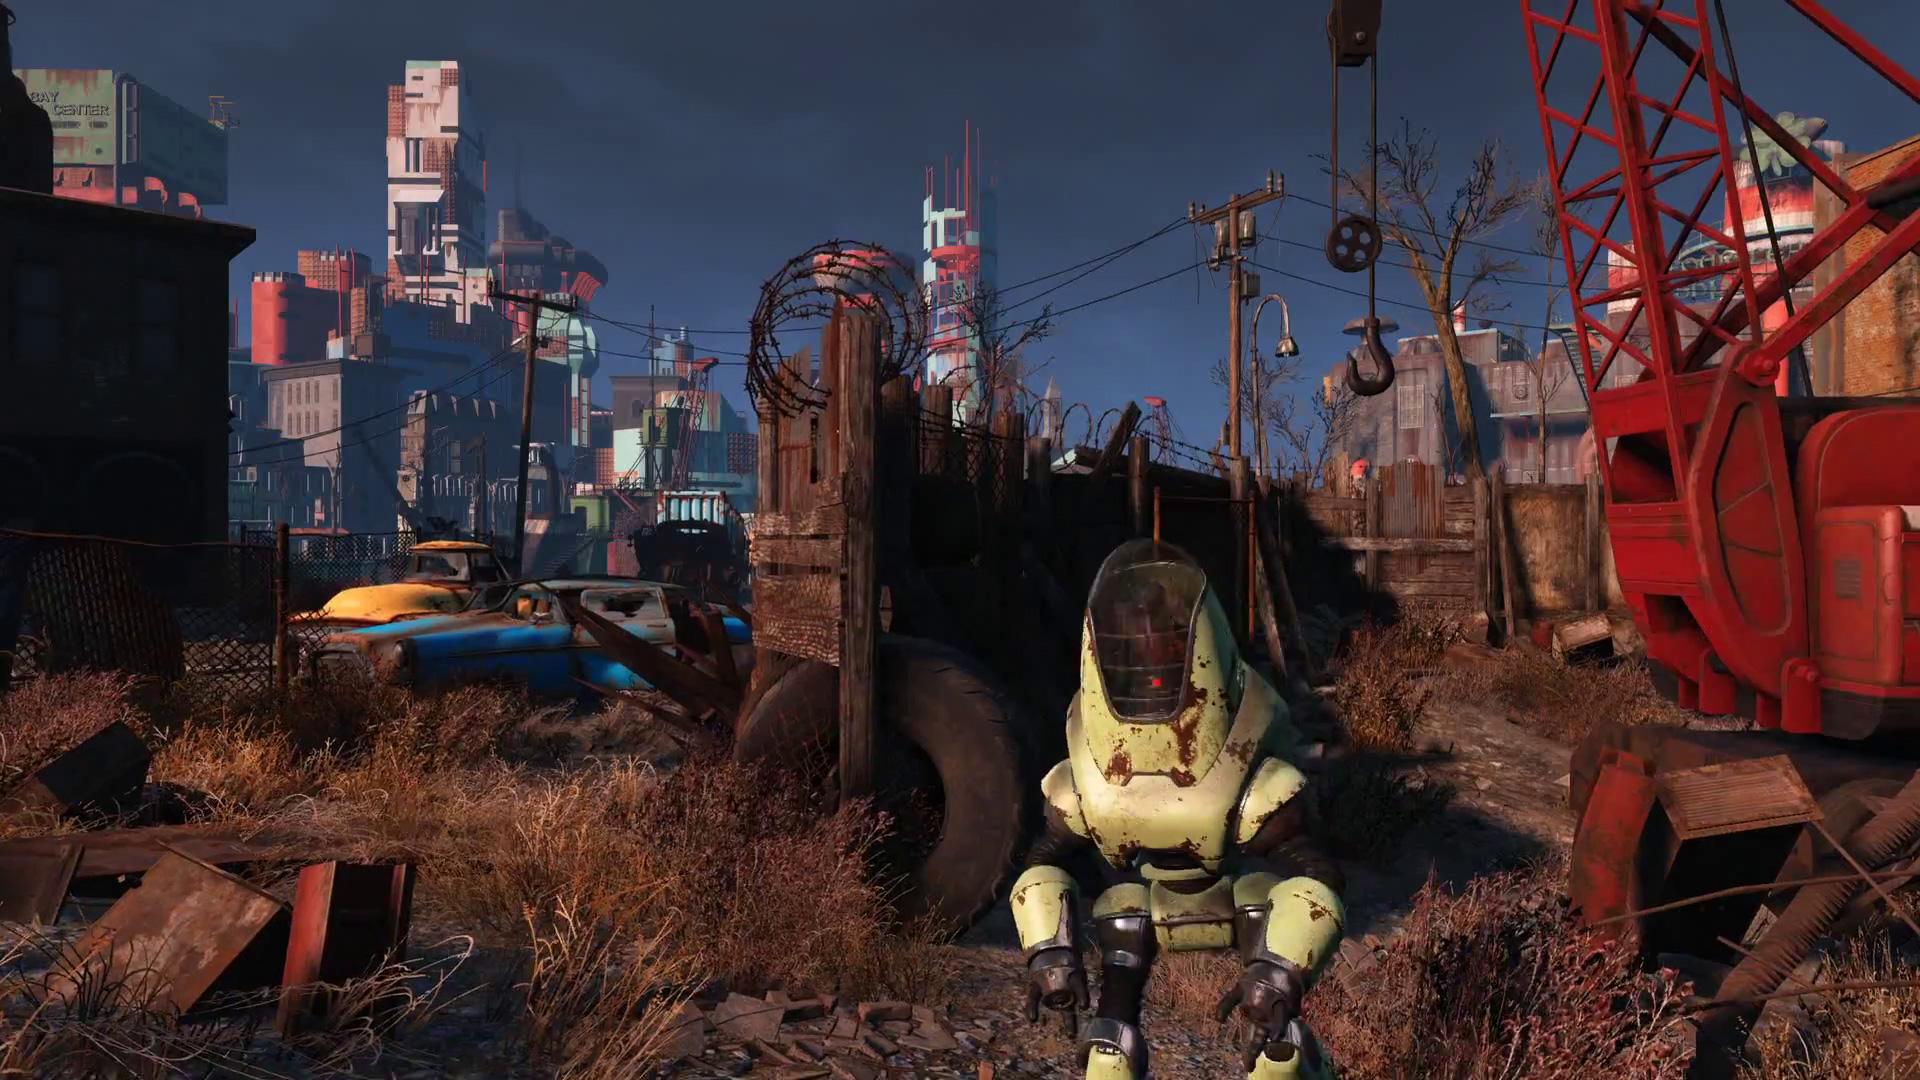 I'm afraid to play Fallout 4